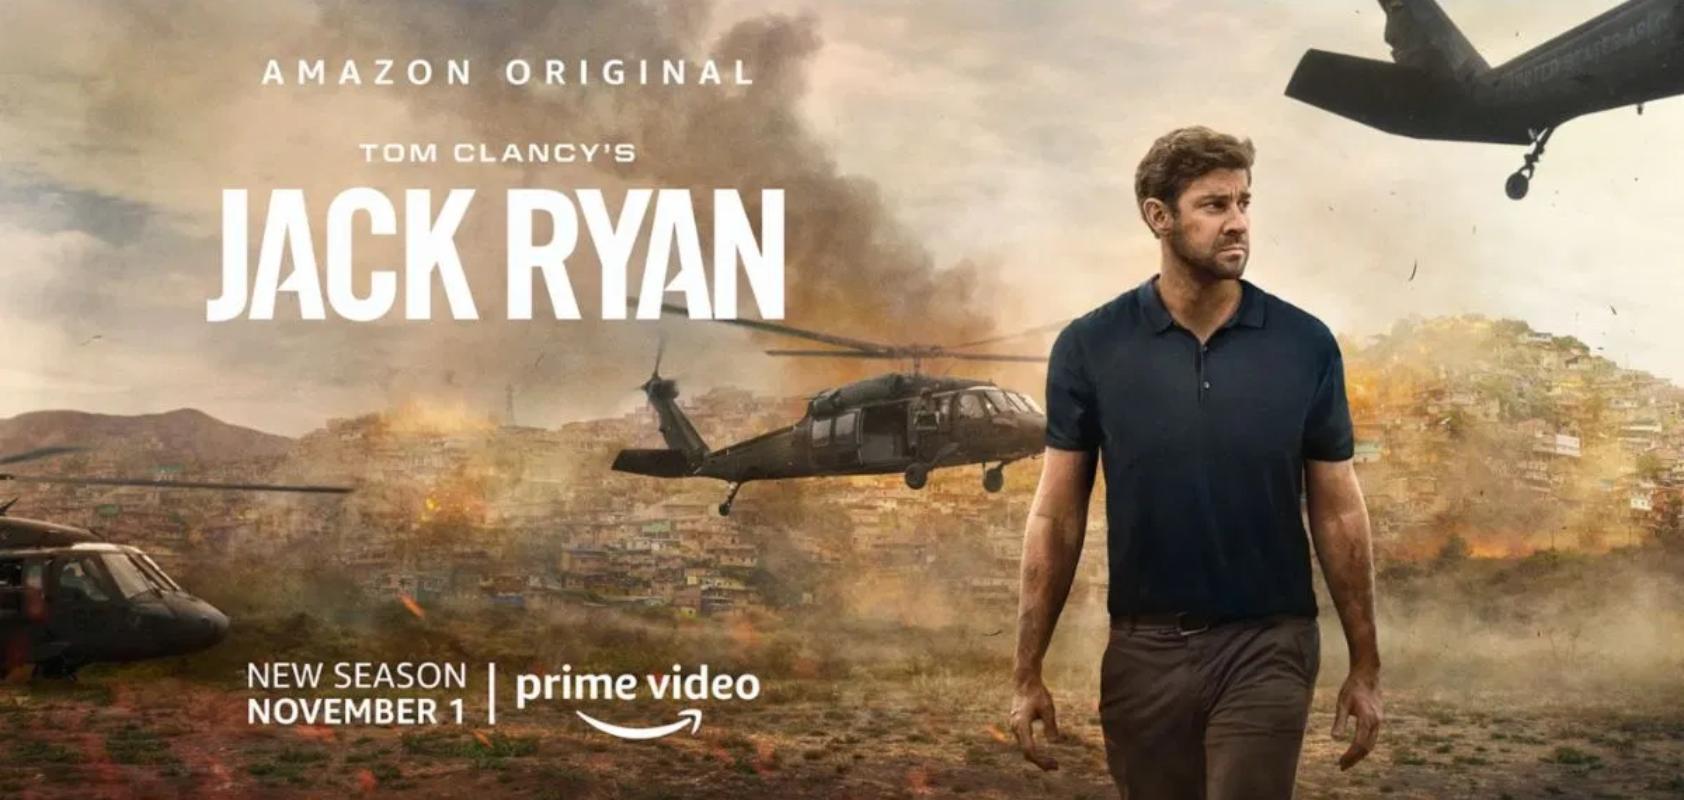 tom clancy jack ryan amazon prime video